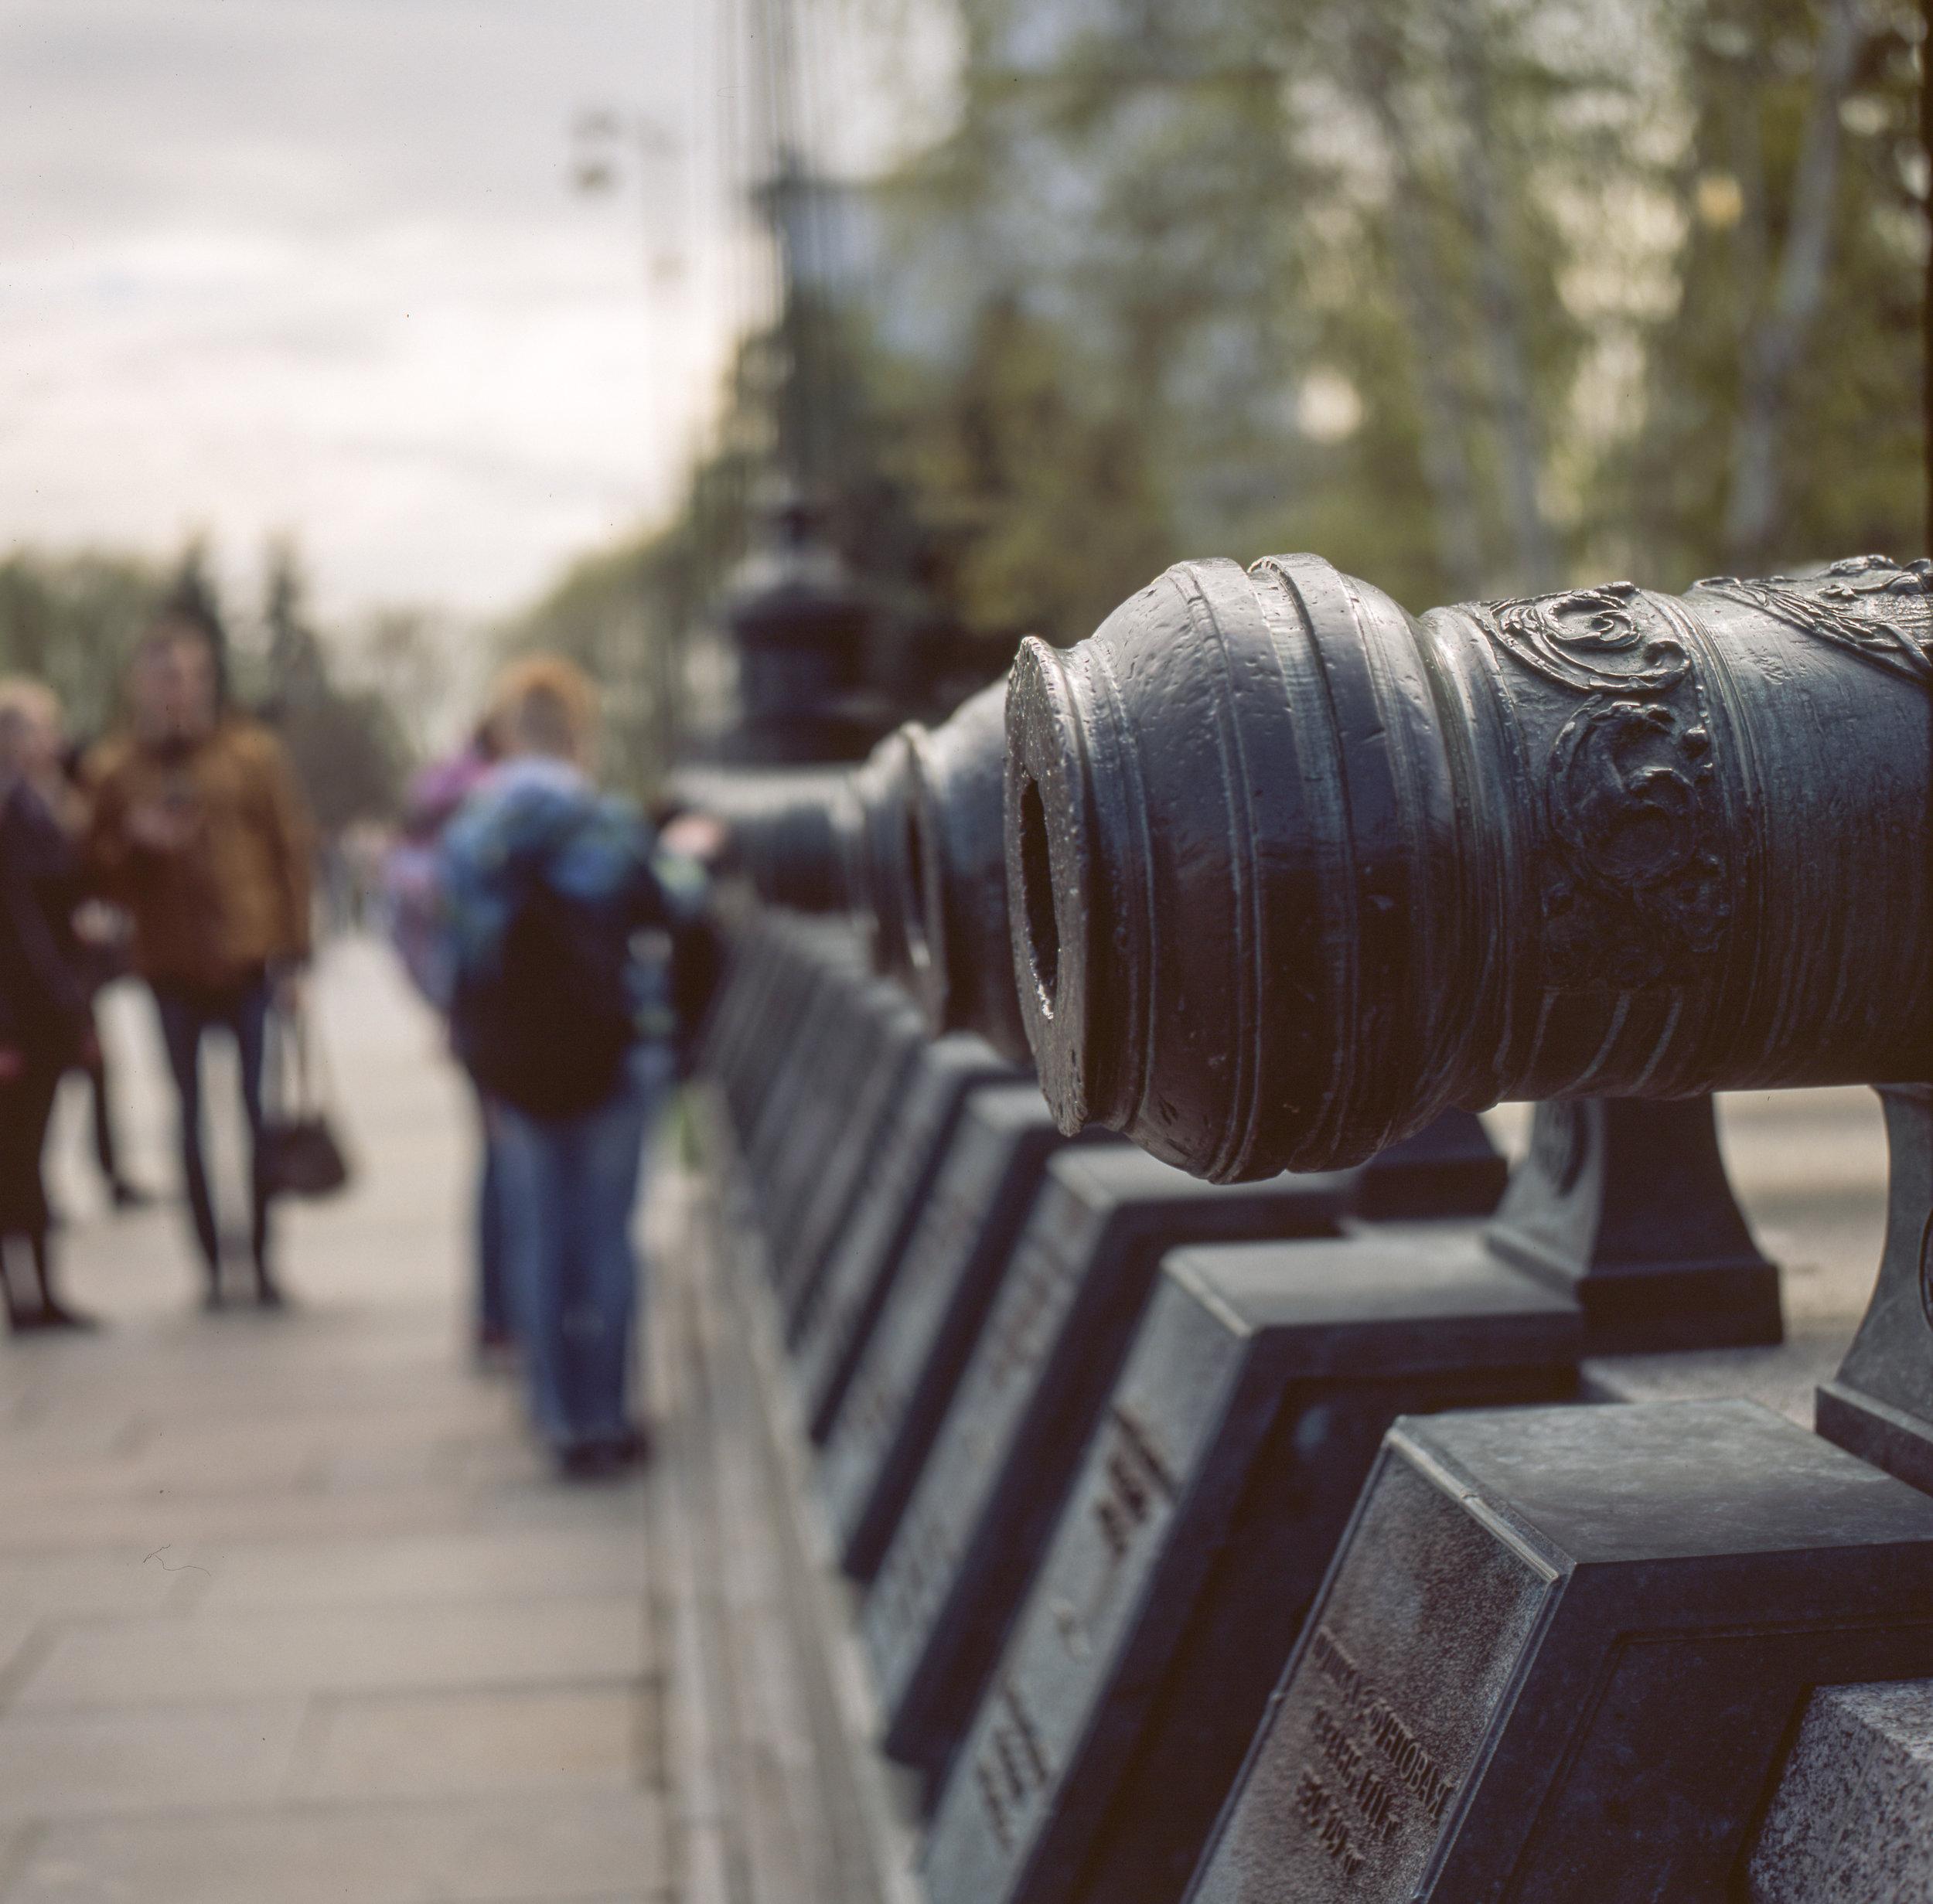 Cannon at the Kremlin Fuji GF670 | Fuji Provia 100f